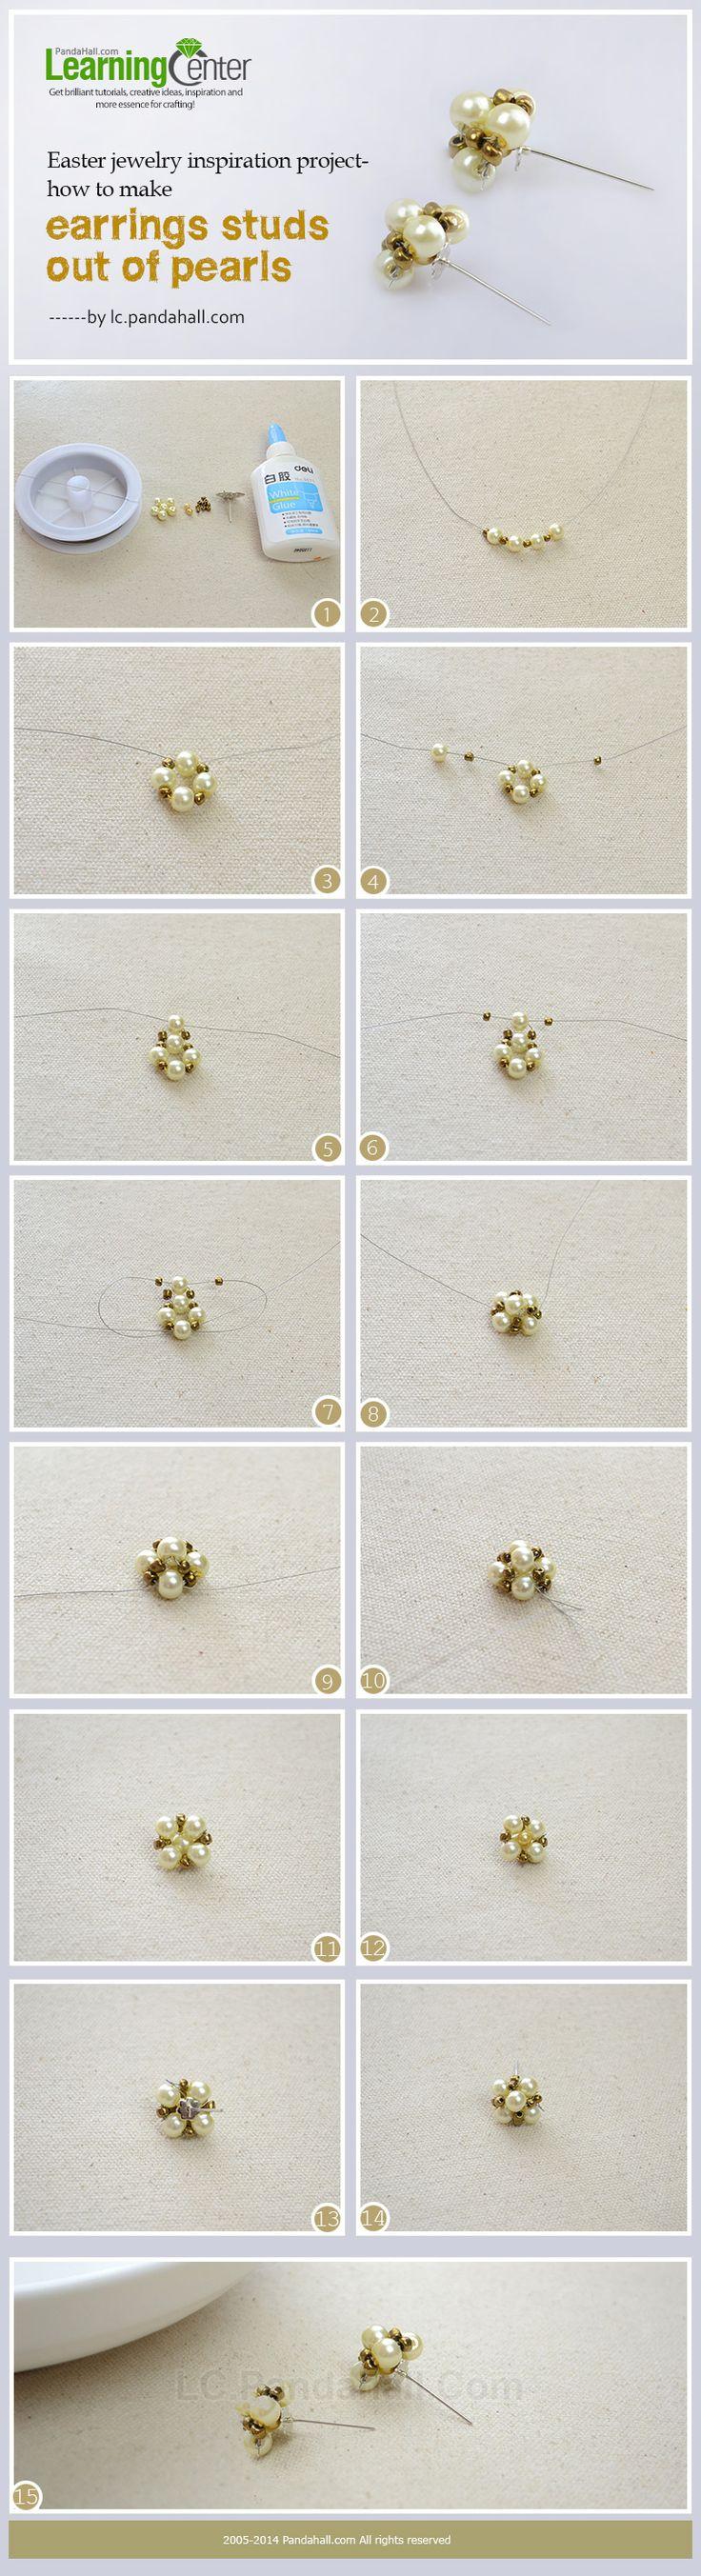 How do You Make Handmade Pearl Stud Earrings Step by Step (Diy Step Brick)